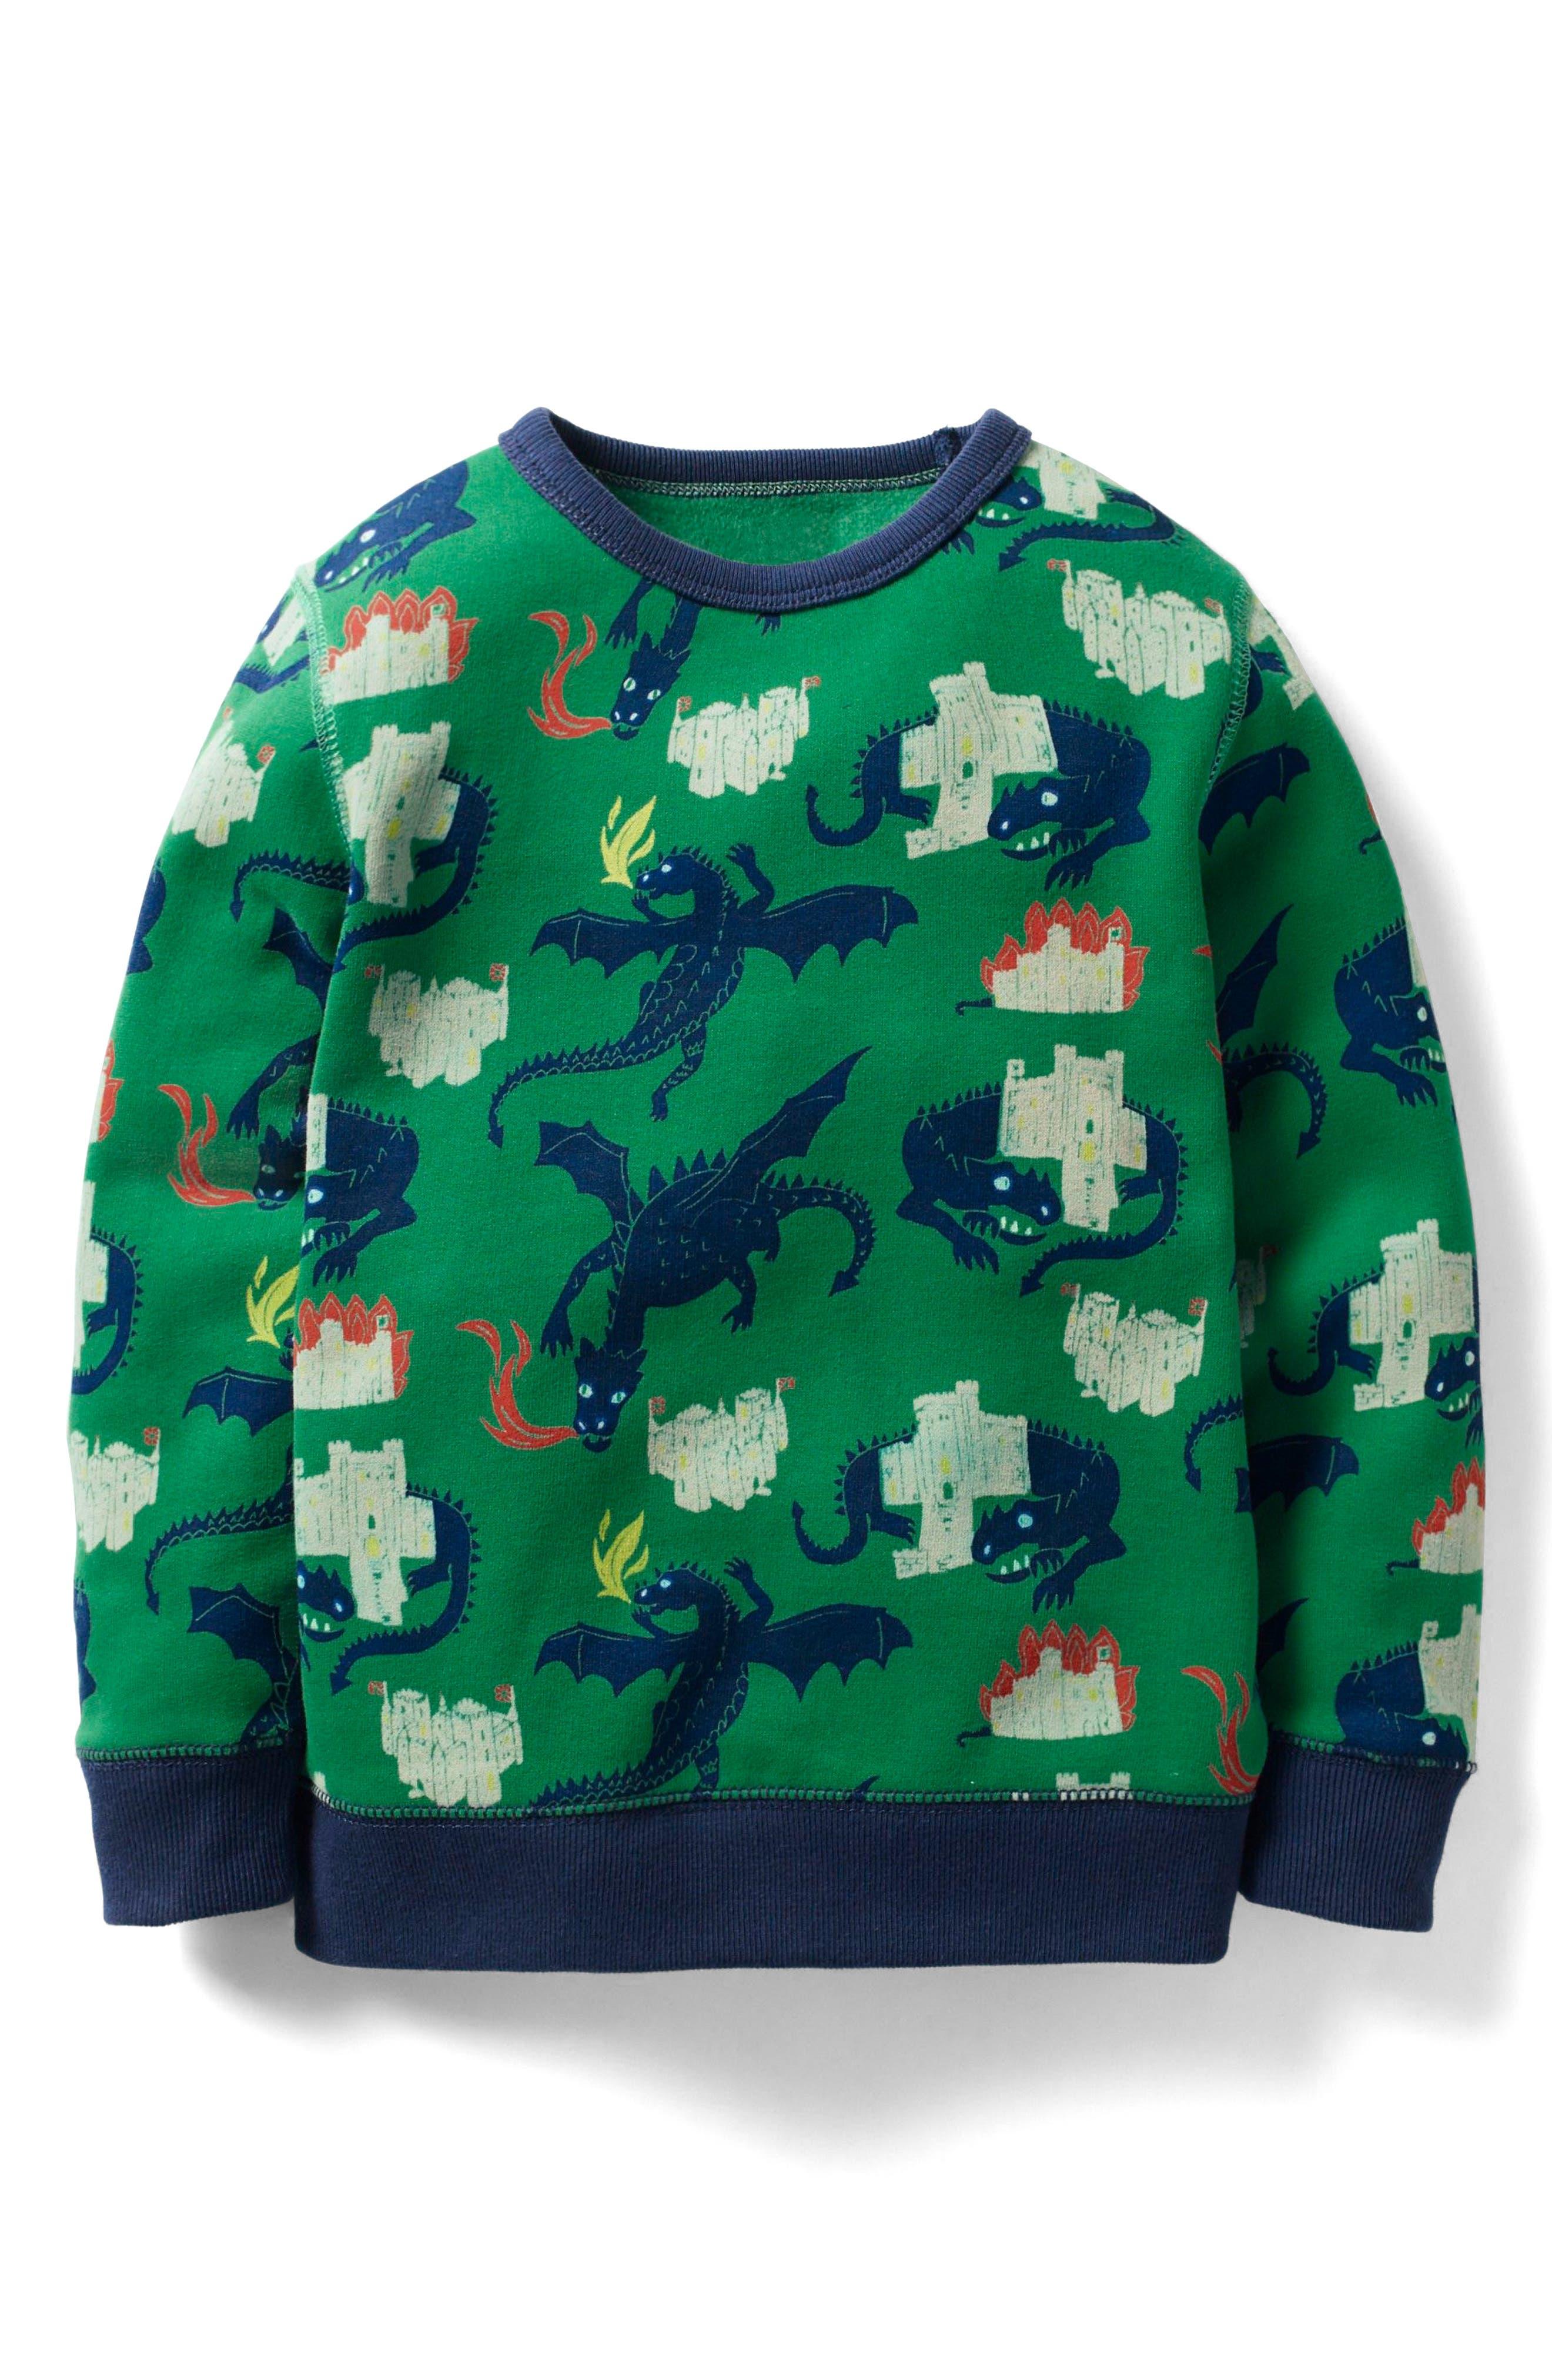 Hero's Tale Sweatshirt,                             Main thumbnail 1, color,                             315